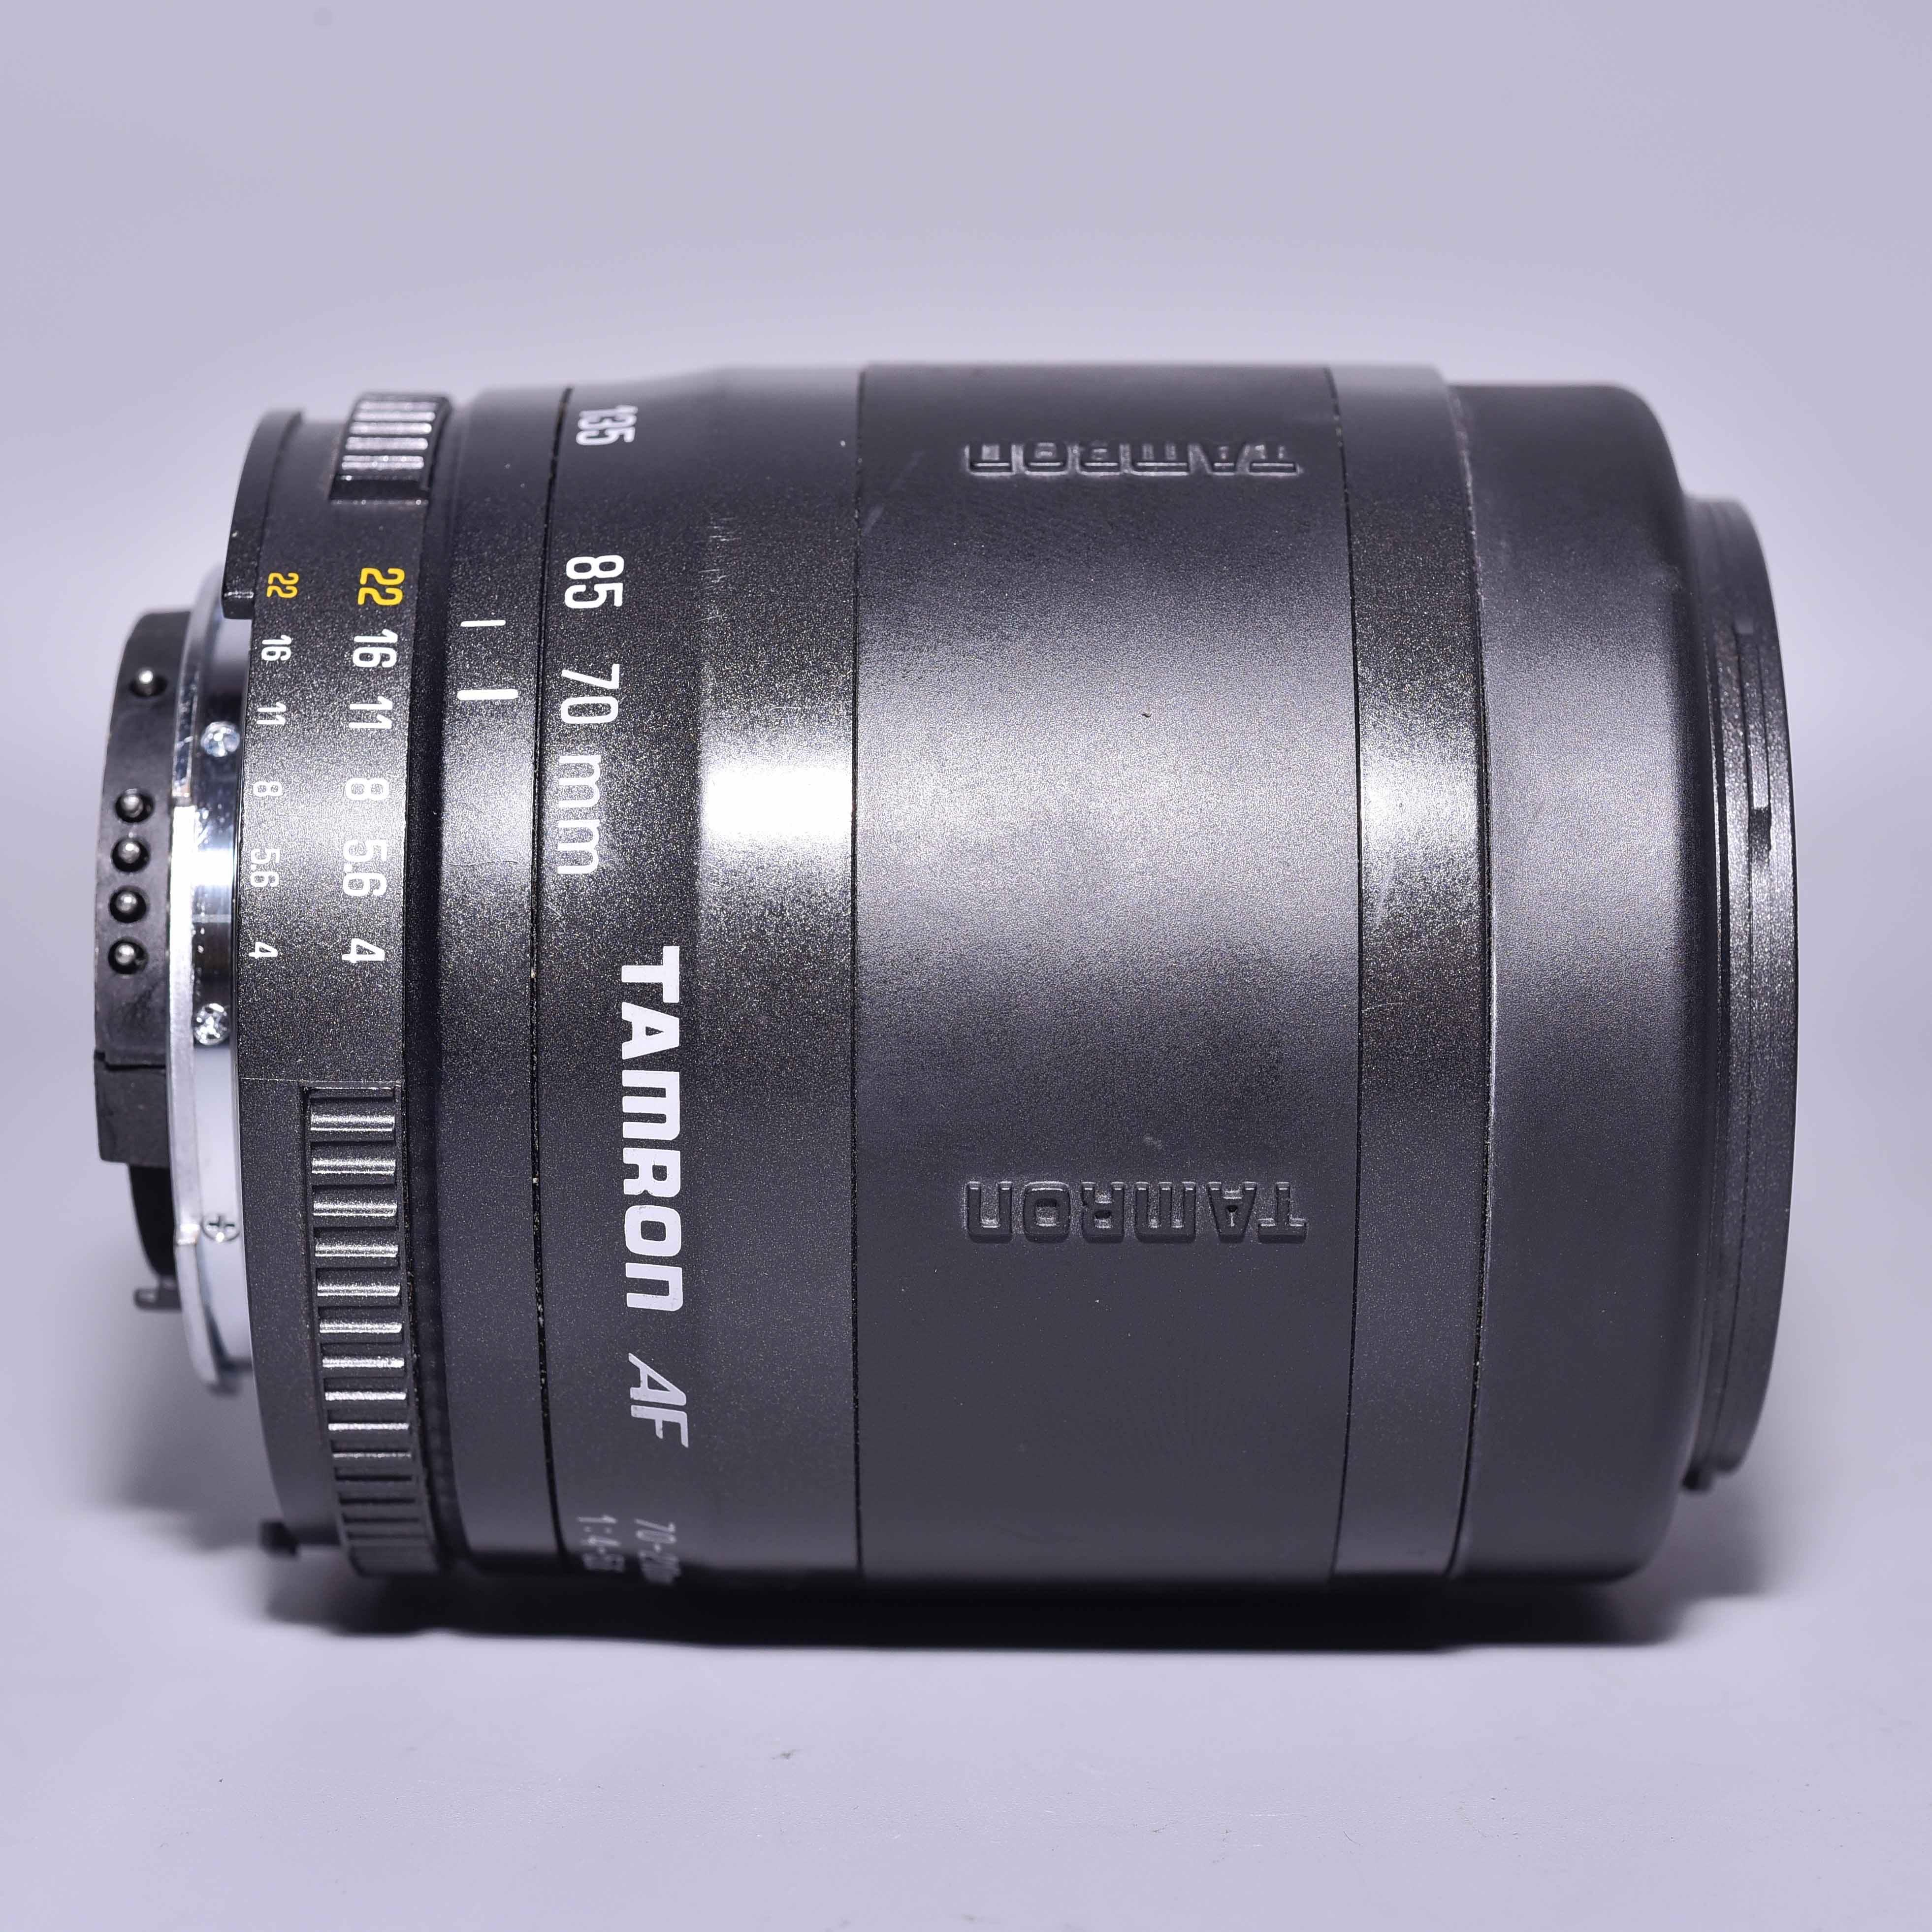 tamron-70-210mm-f4-0-5-6-af-nikon-70-210-4-0-5-6-10510